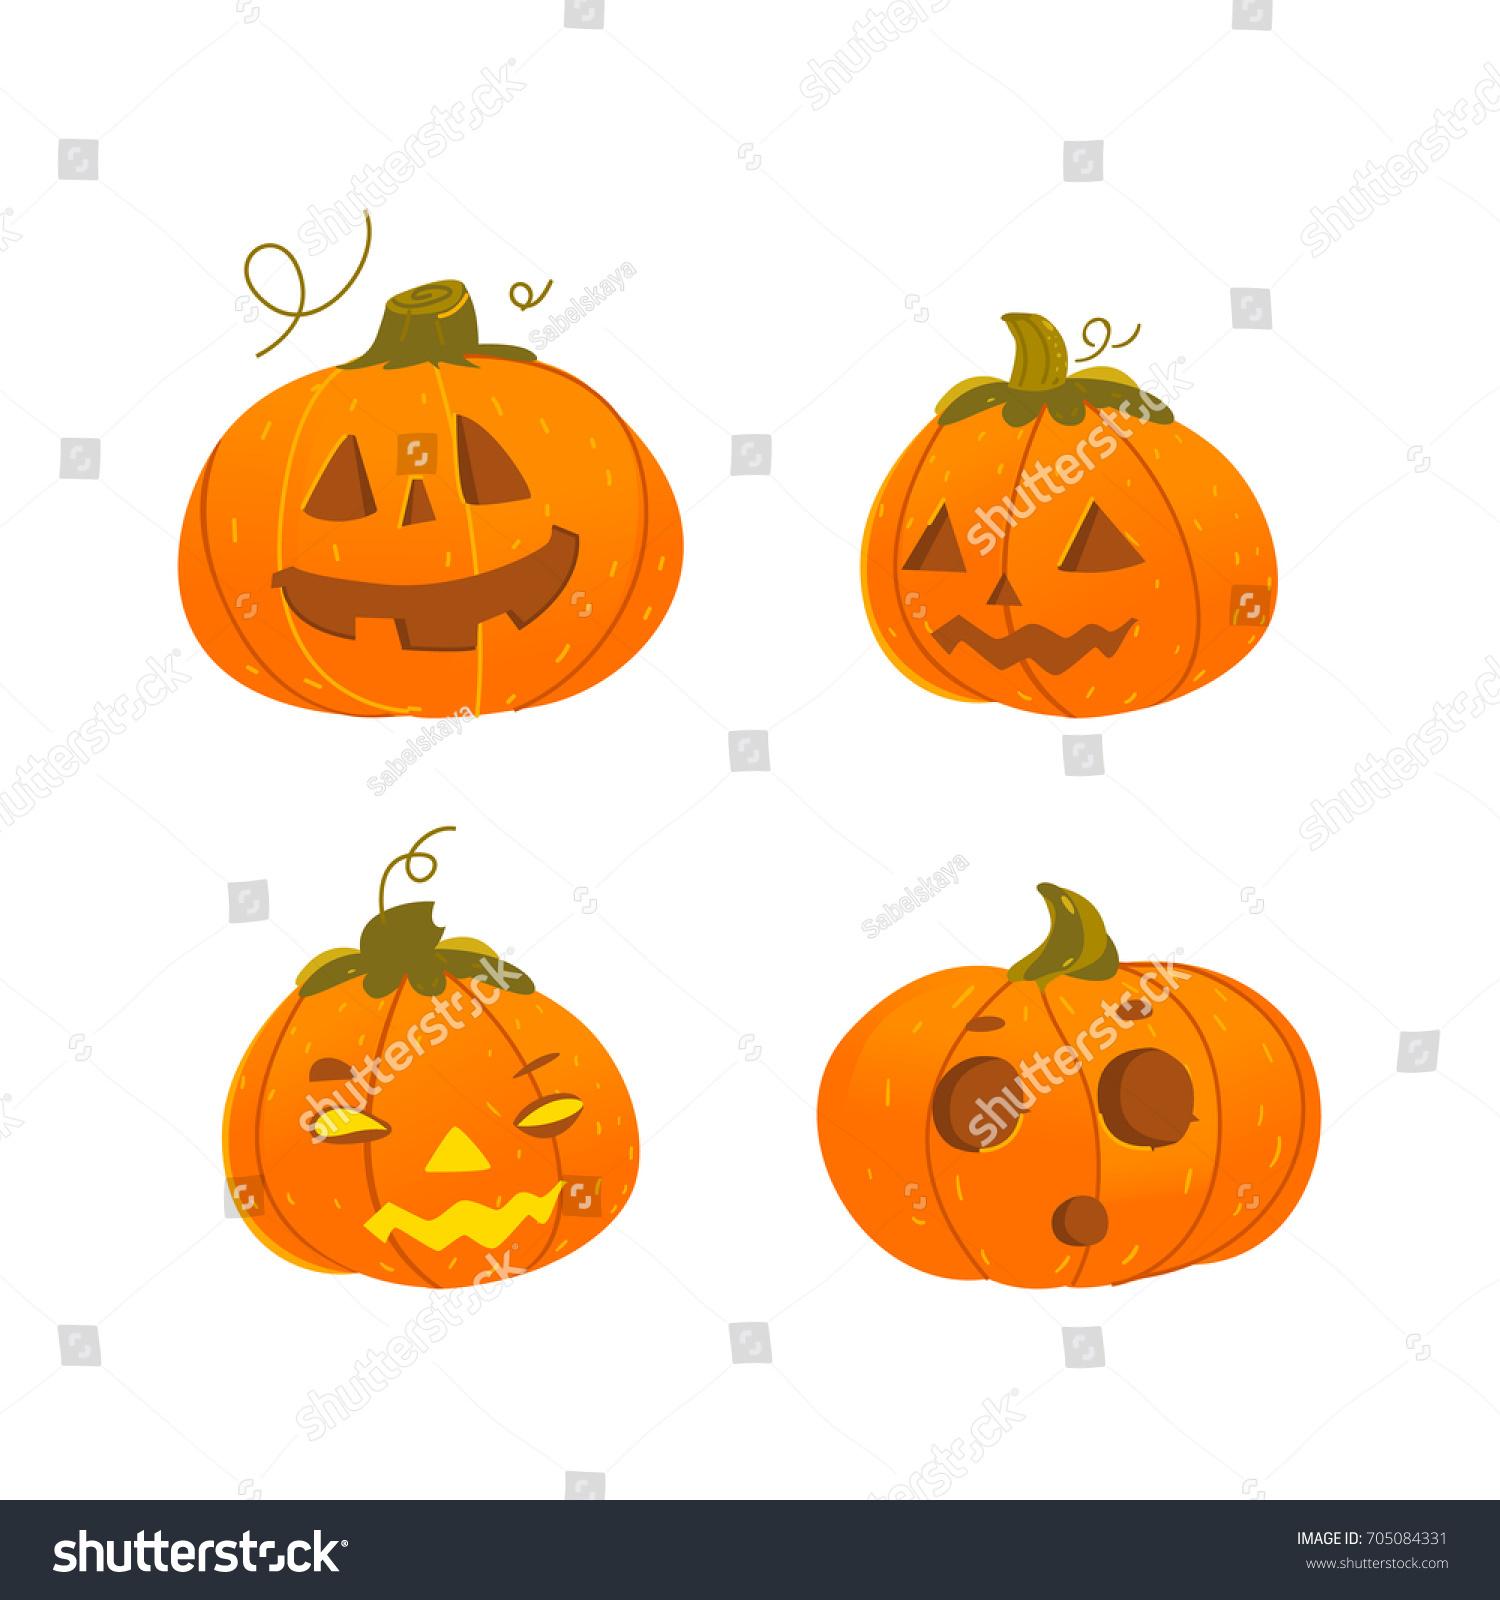 set of cute, funny halloween pumpkin jack-o-lanterns - smiling